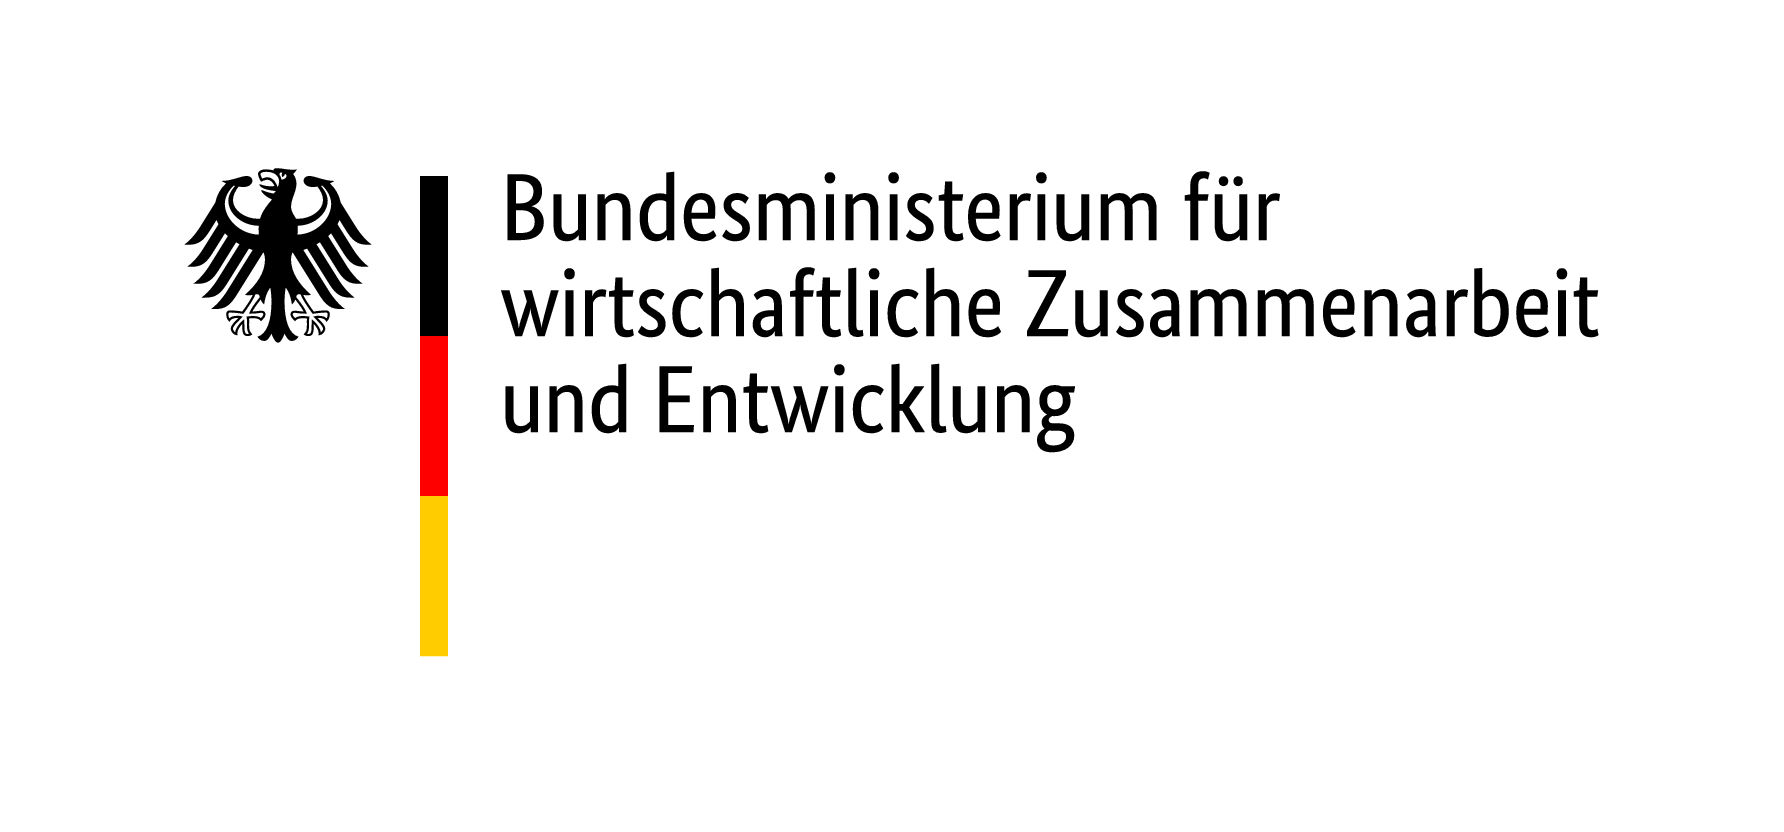 BMZ_2017_Office_Farbe_de.png